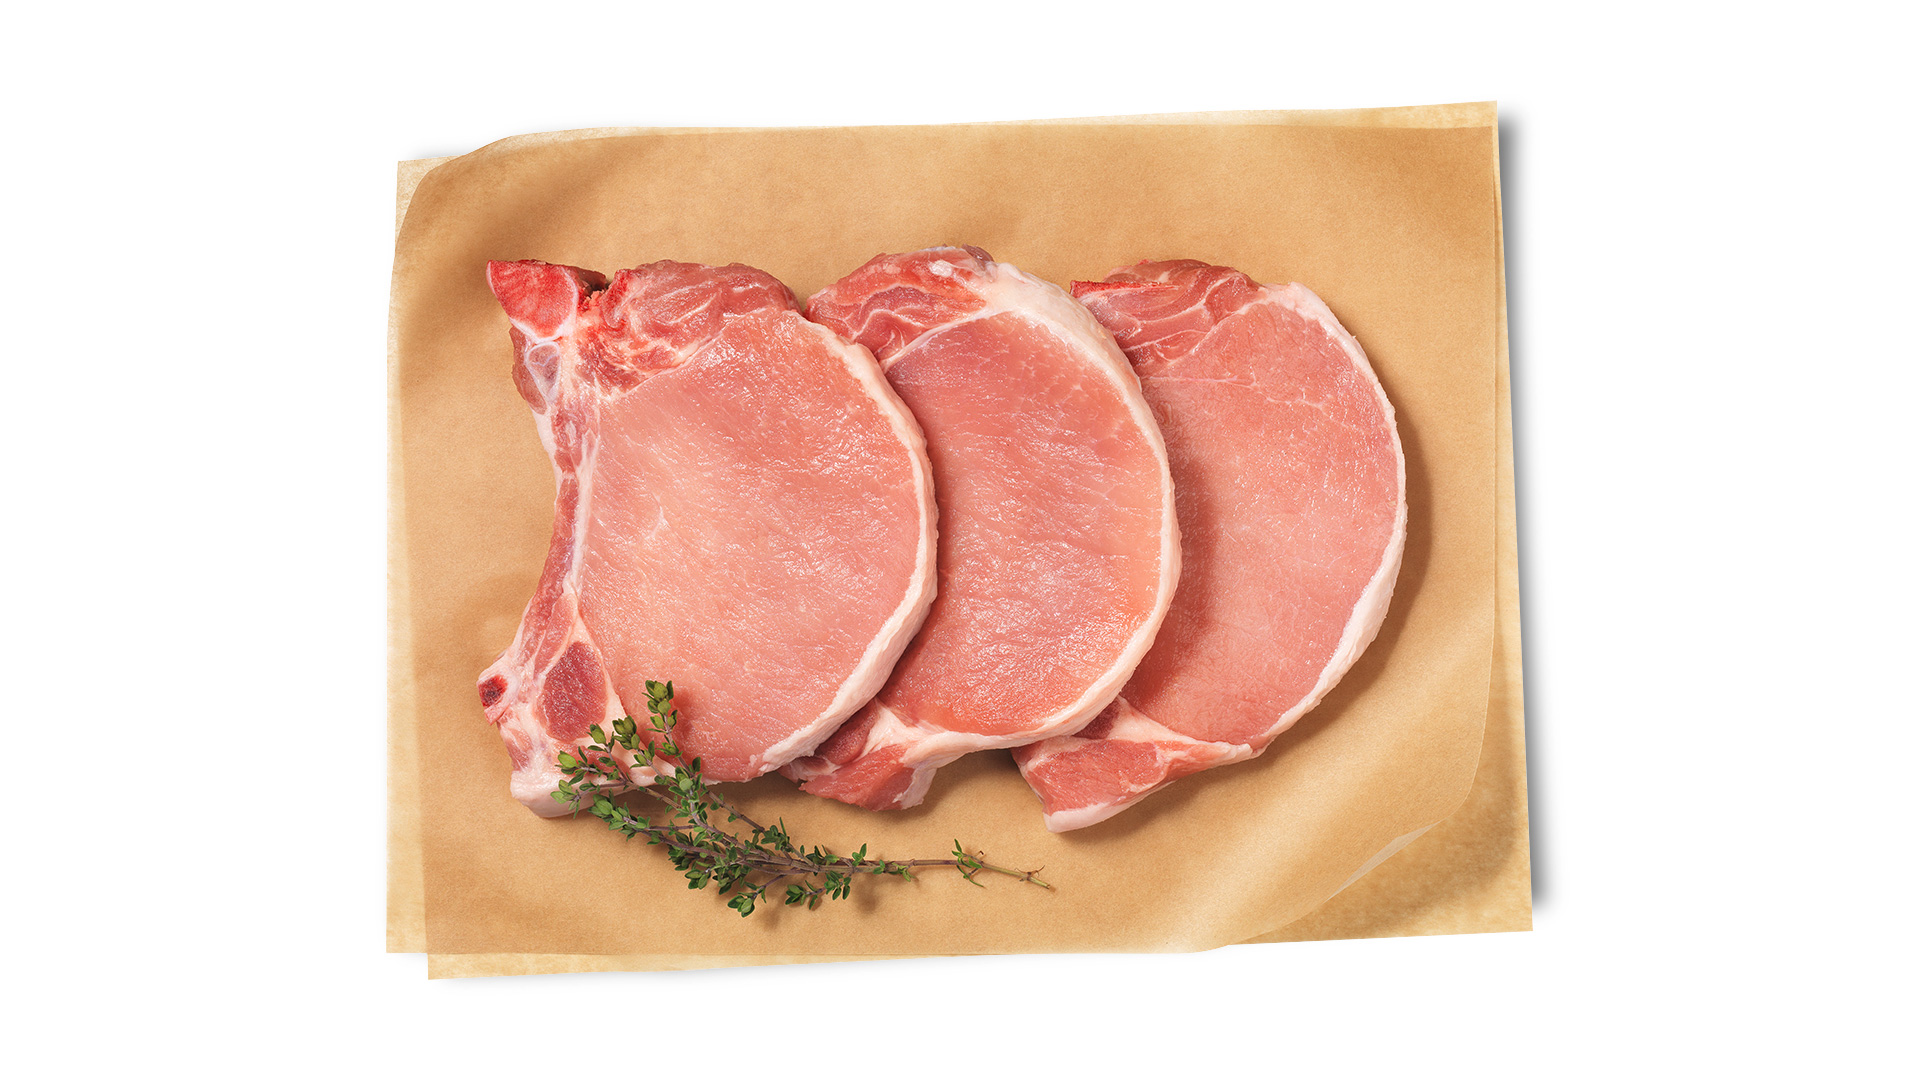 Hofstädter Schweinskotelett geschnitten